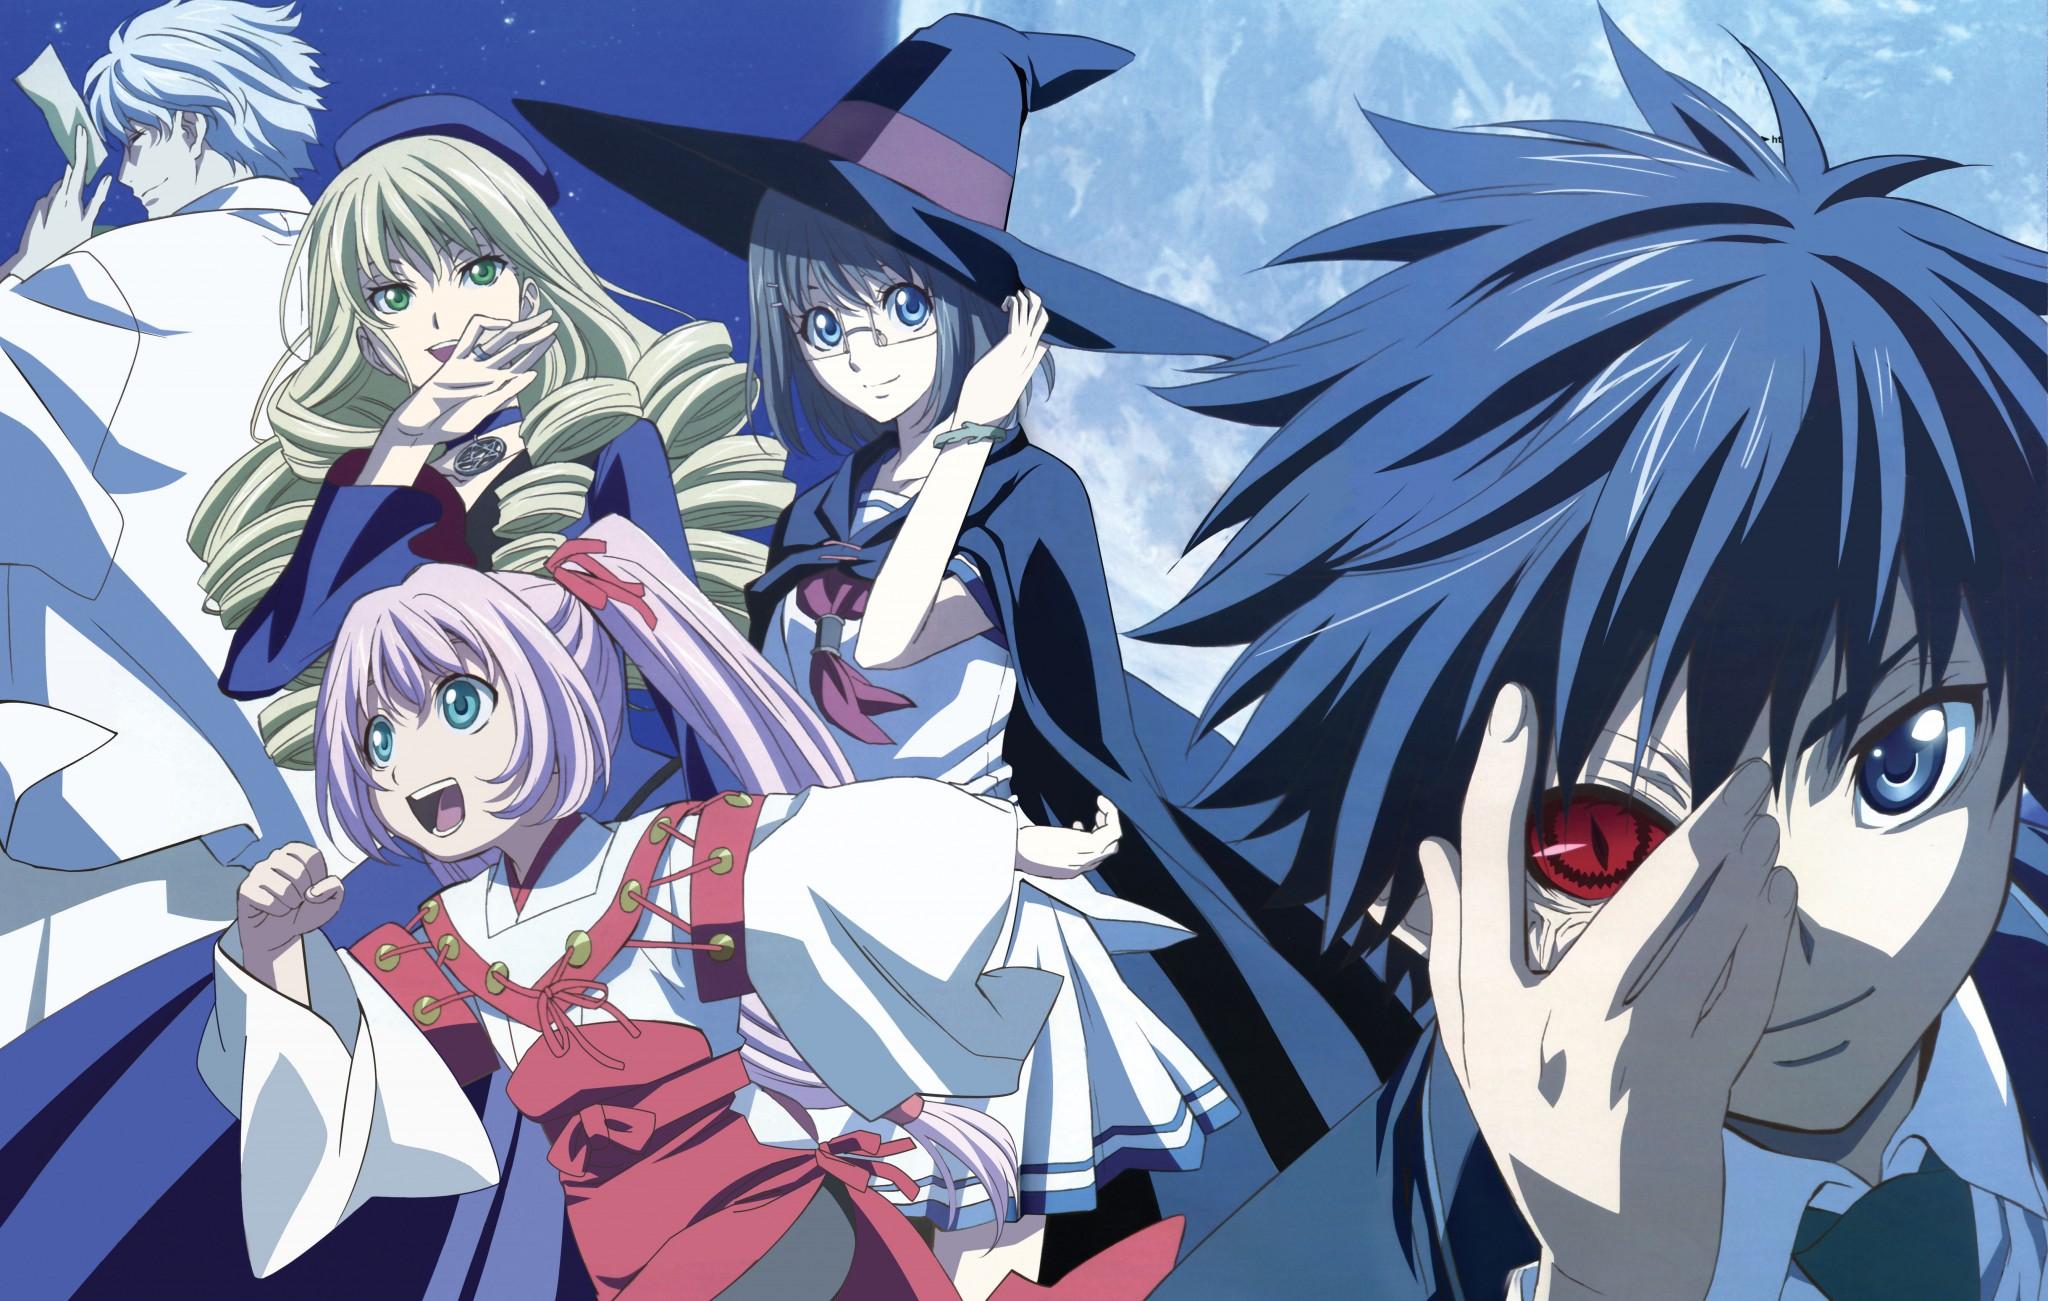 Digital Terrestrial Channel Yey Premieres Mystery Anime Rental Magica